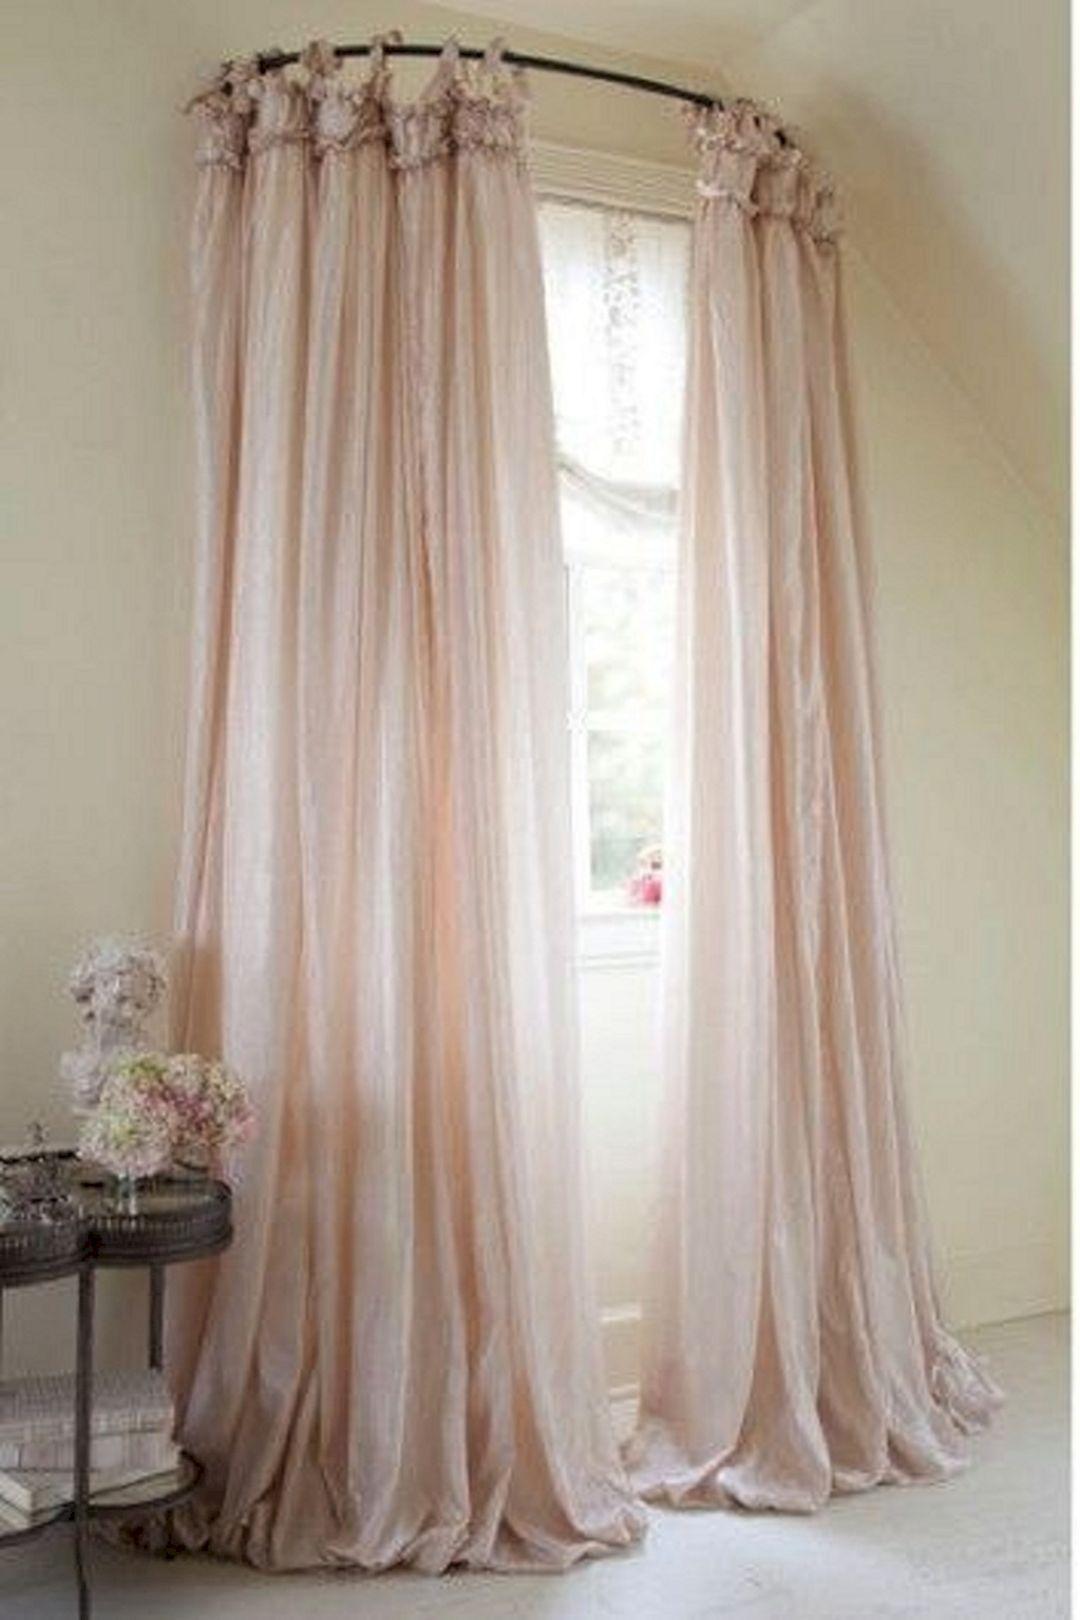 Beautiful Curtain Princess Design Ideas 23 With Images Home Decor